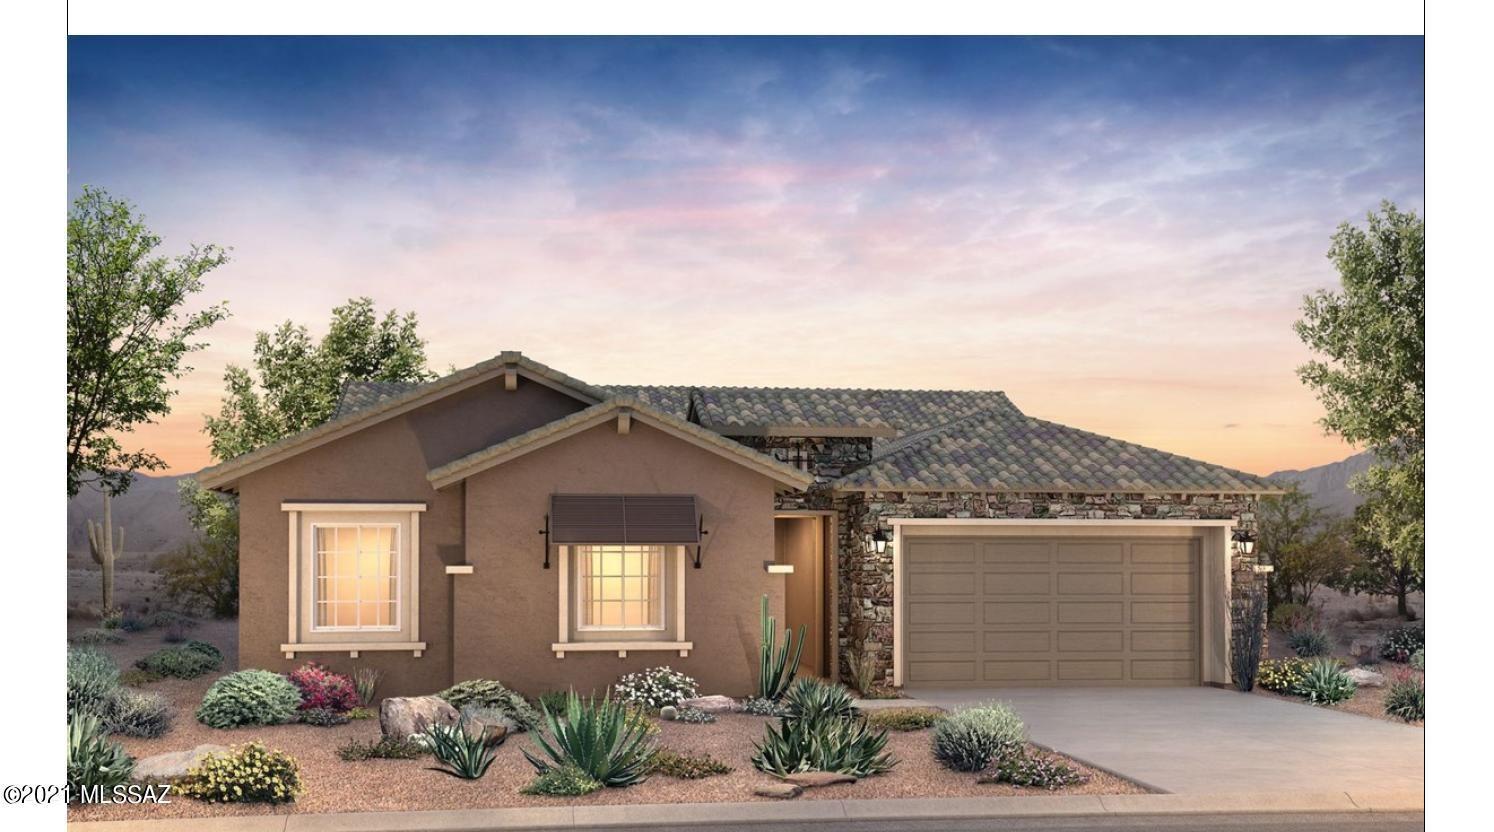 686 E Nubra Valley Place, Oro Valley, AZ 85755 - MLS#: 22118686